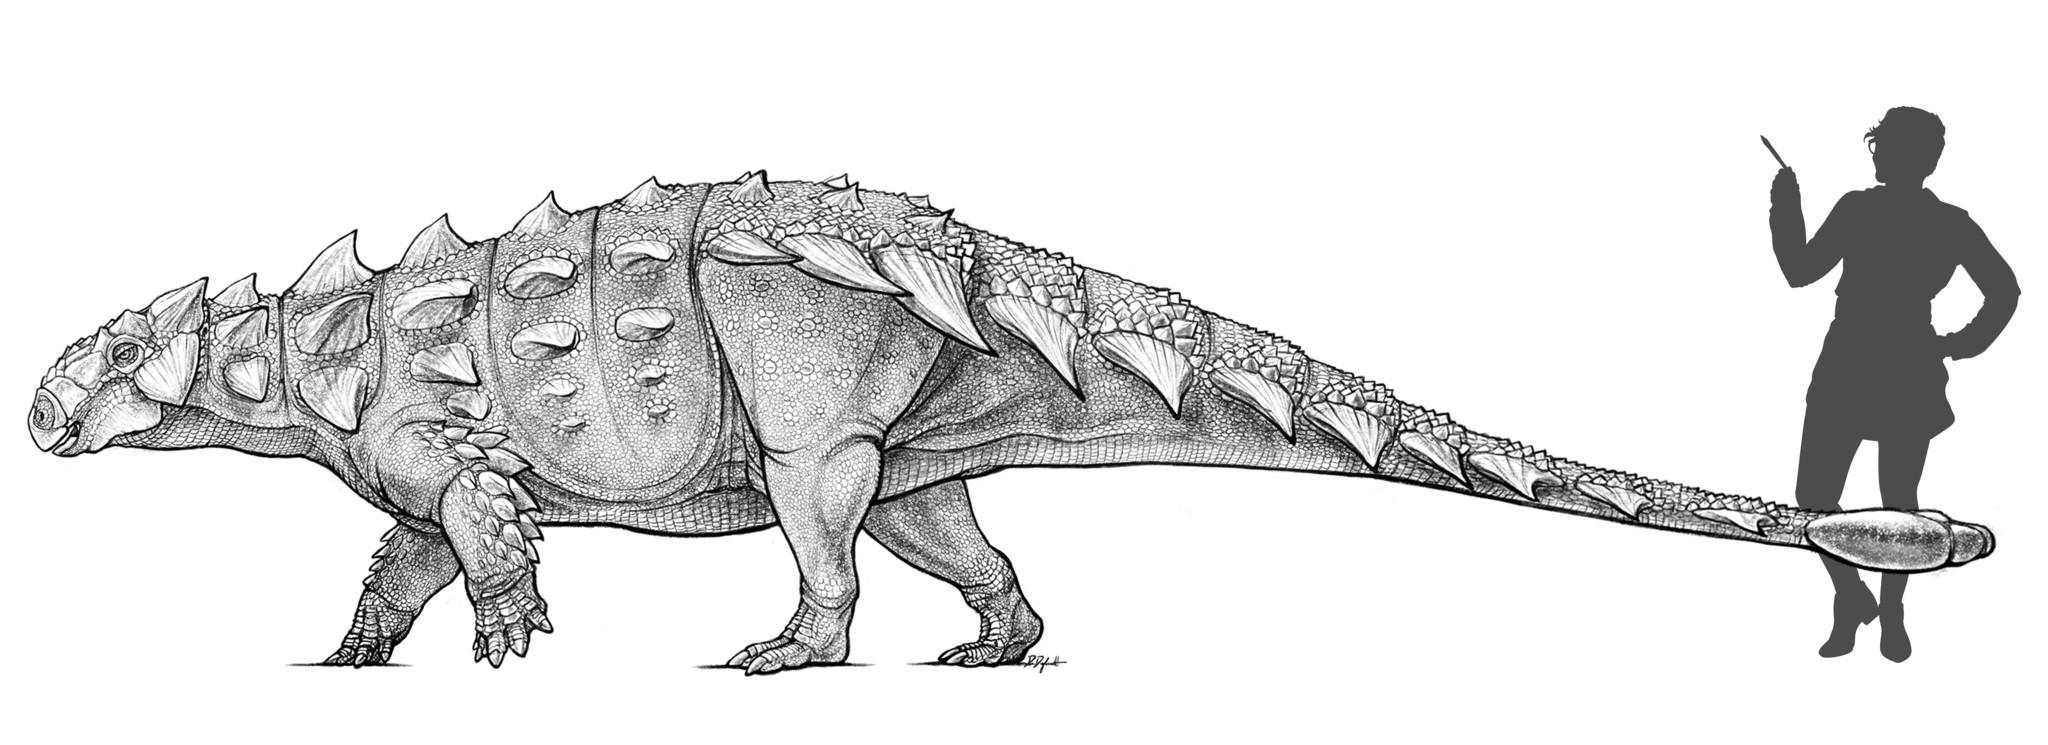 dinosaur named for u0027ghostbusters u0027 creature found in montana 75